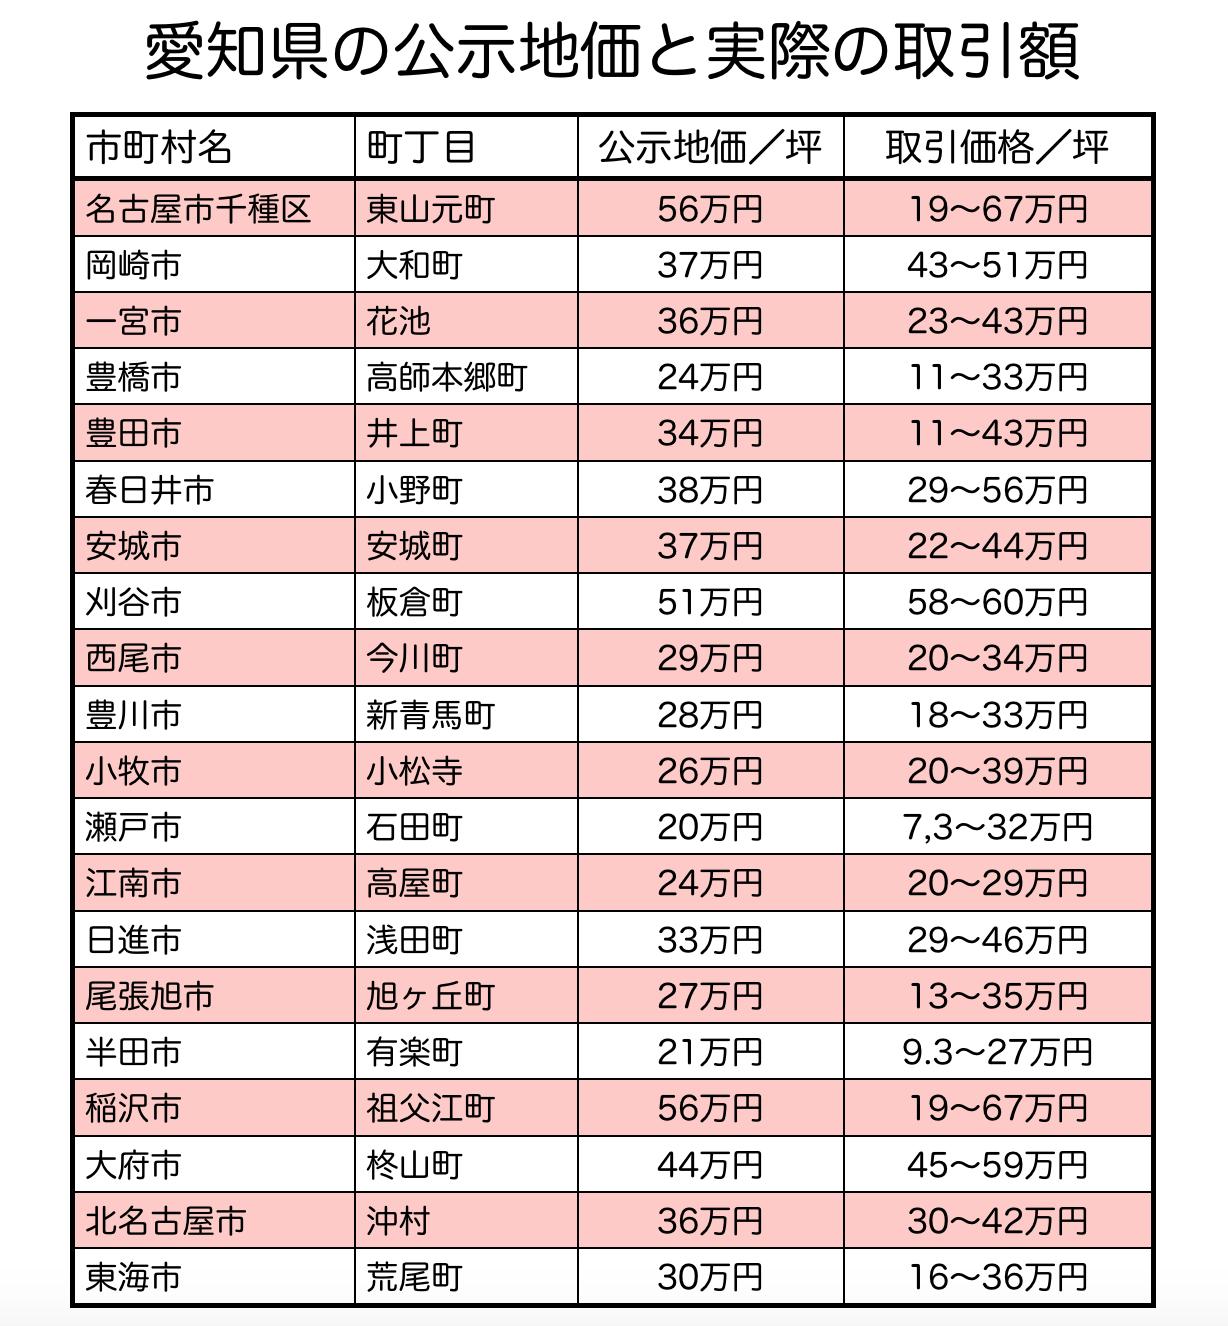 愛知県内の公示地価と取引価格